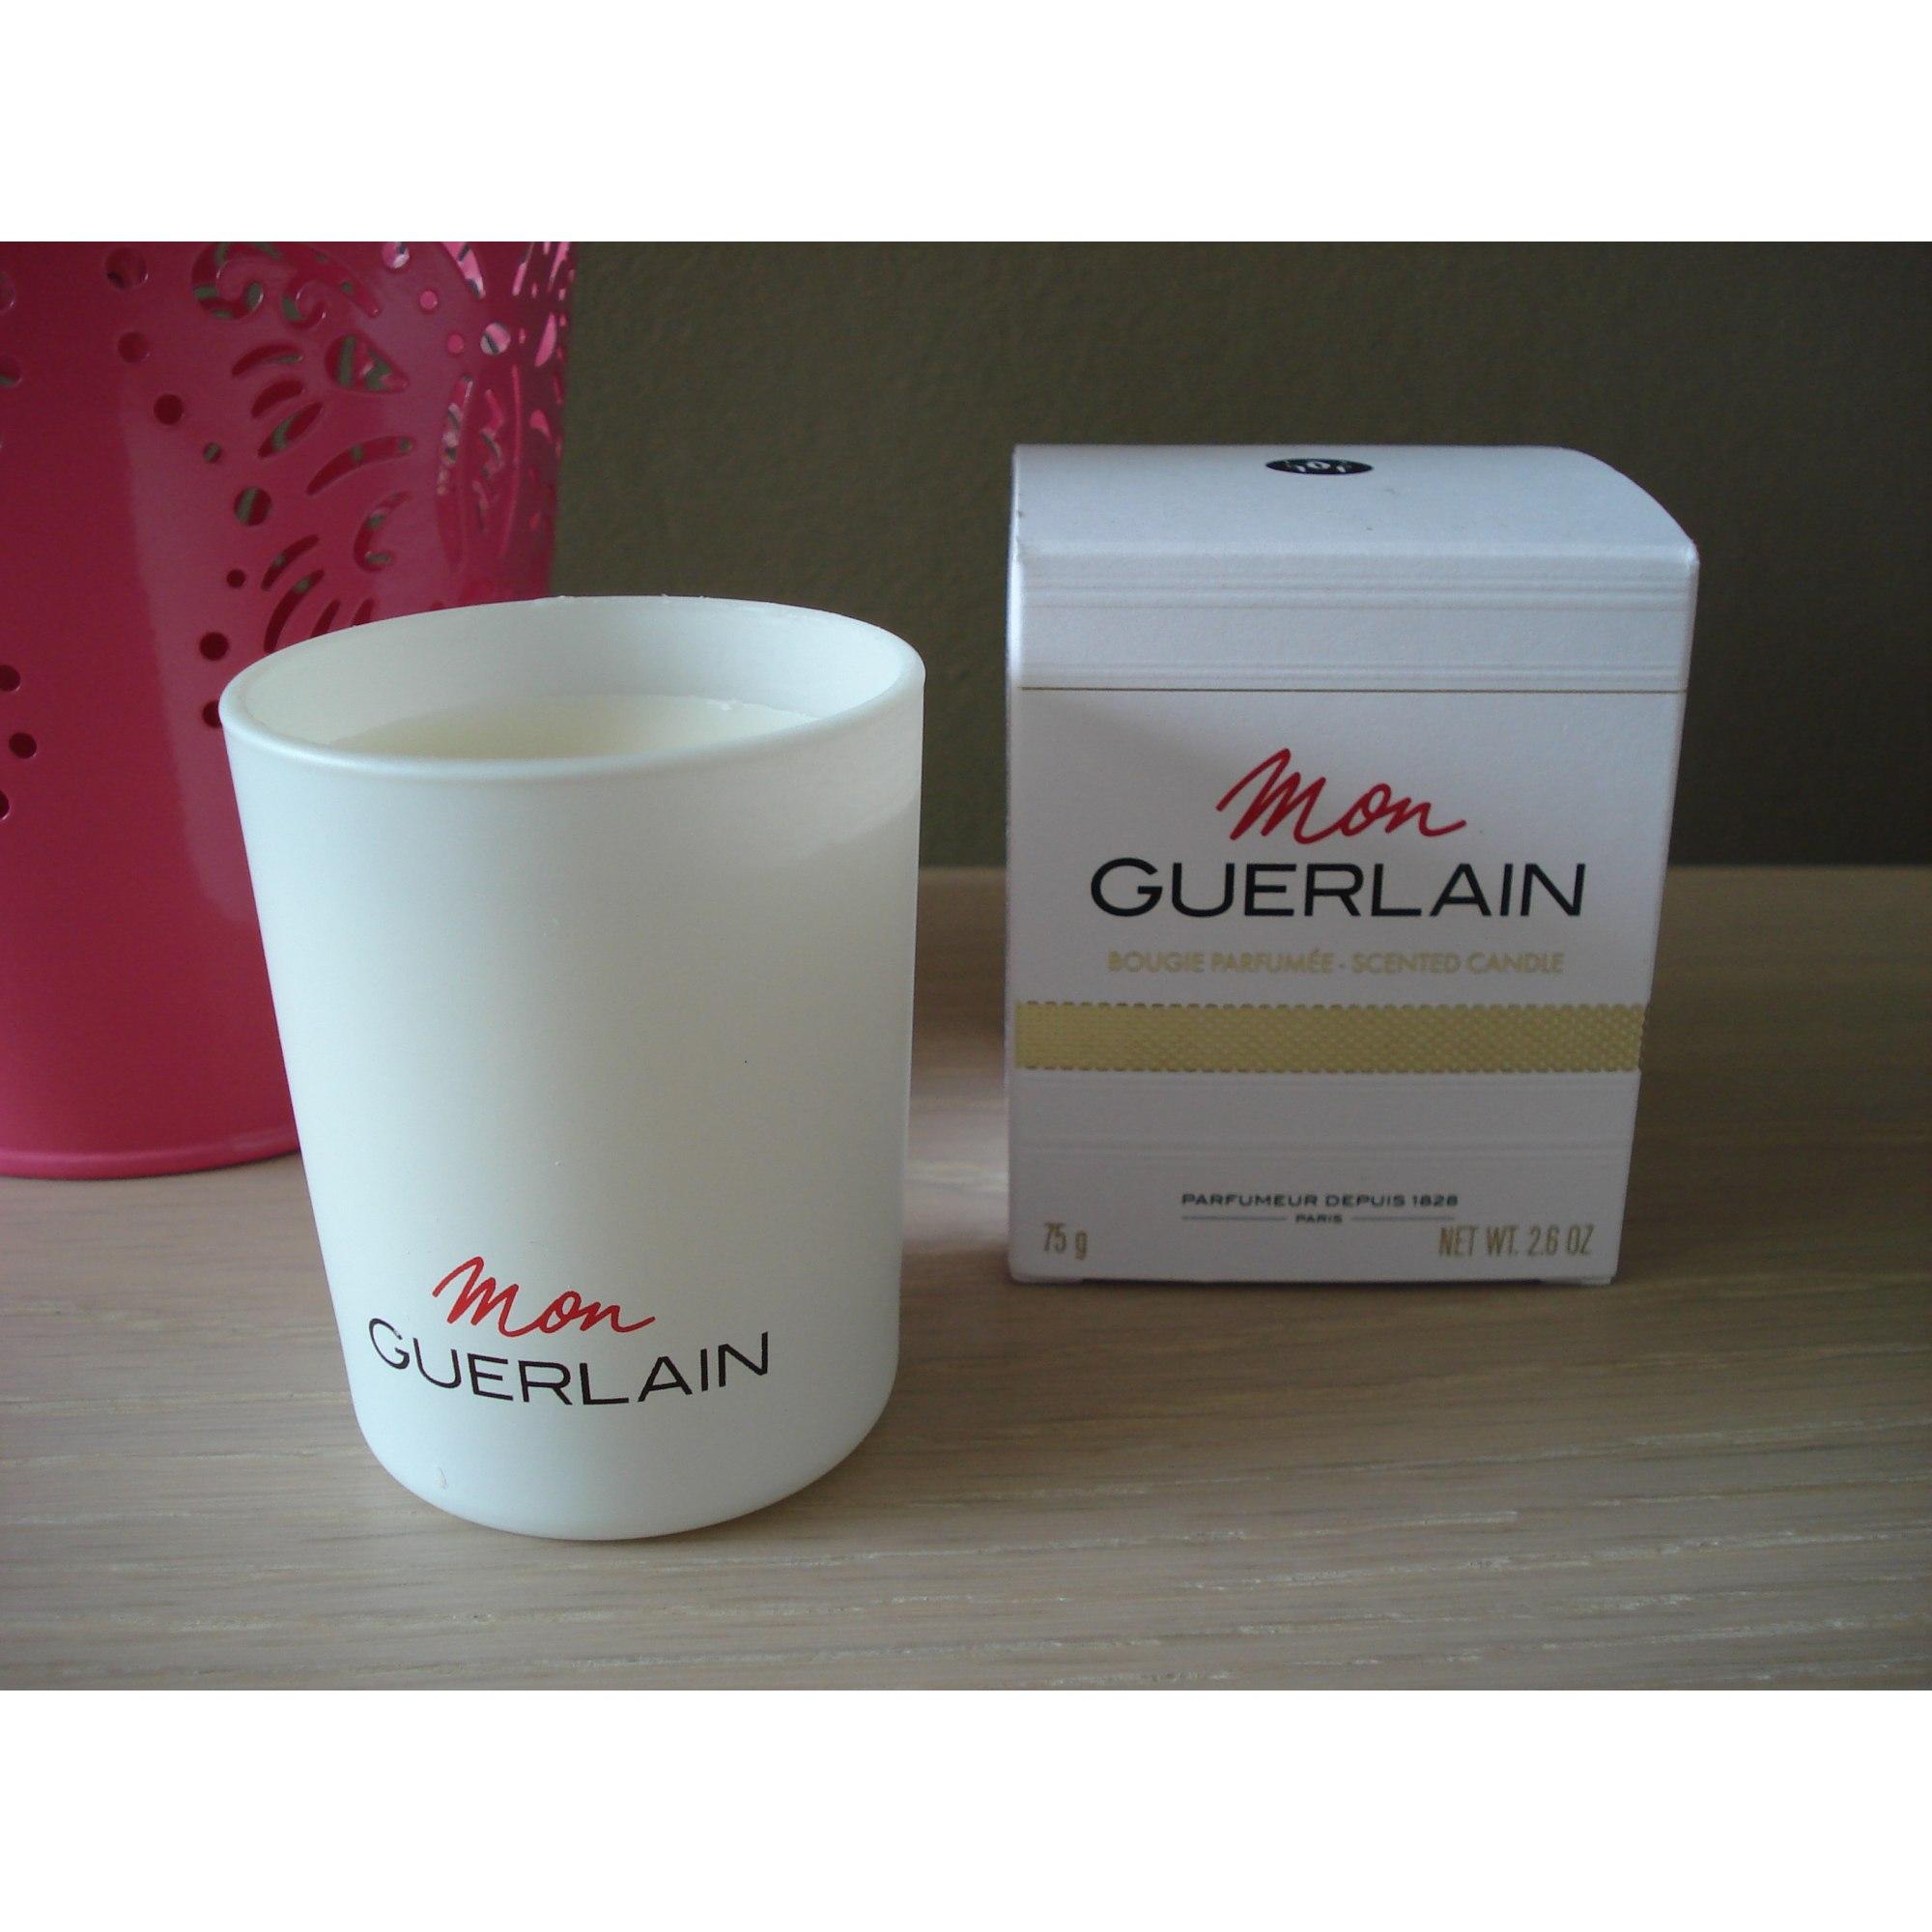 Bougie Bougie Parfumée Guerlain Guerlain Guerlain Parfumée Guerlain Guerlain Parfumée Bougie Parfumée Parfumée Bougie Bougie Bougie QoBerCdxW